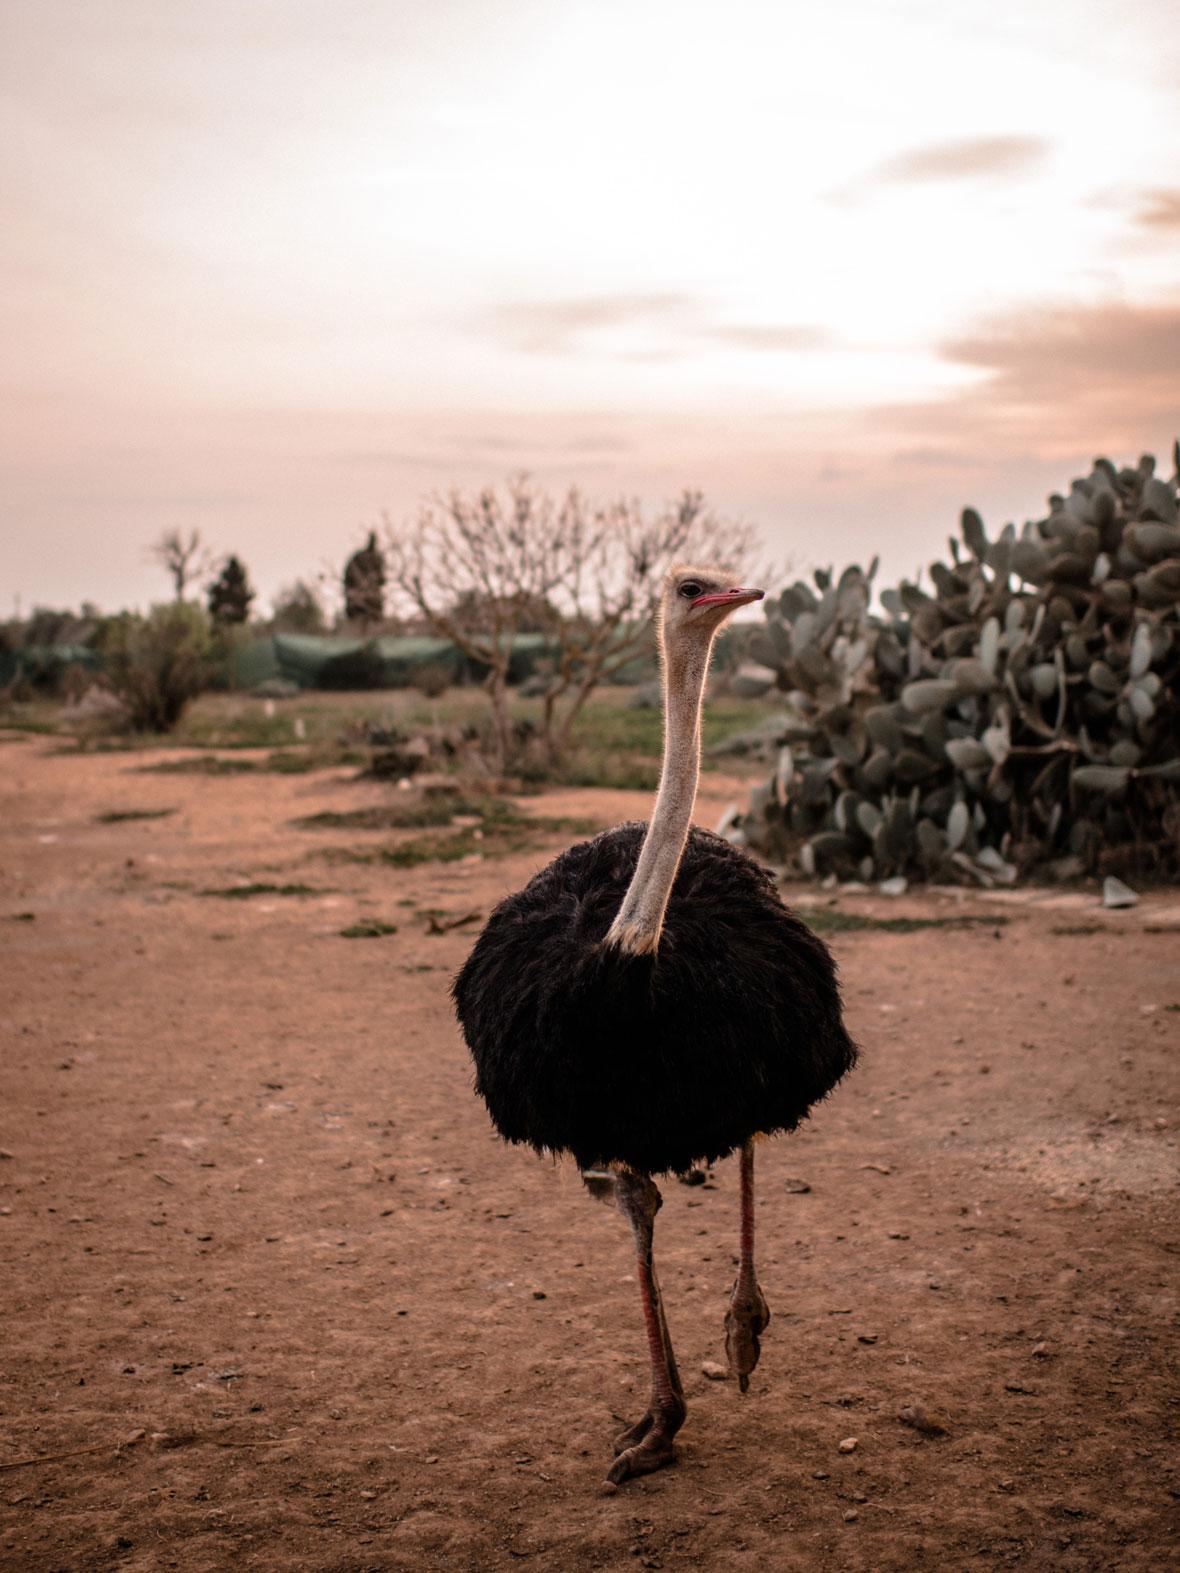 ostrich, estruç, mallorca, activitats, holidays, weekend